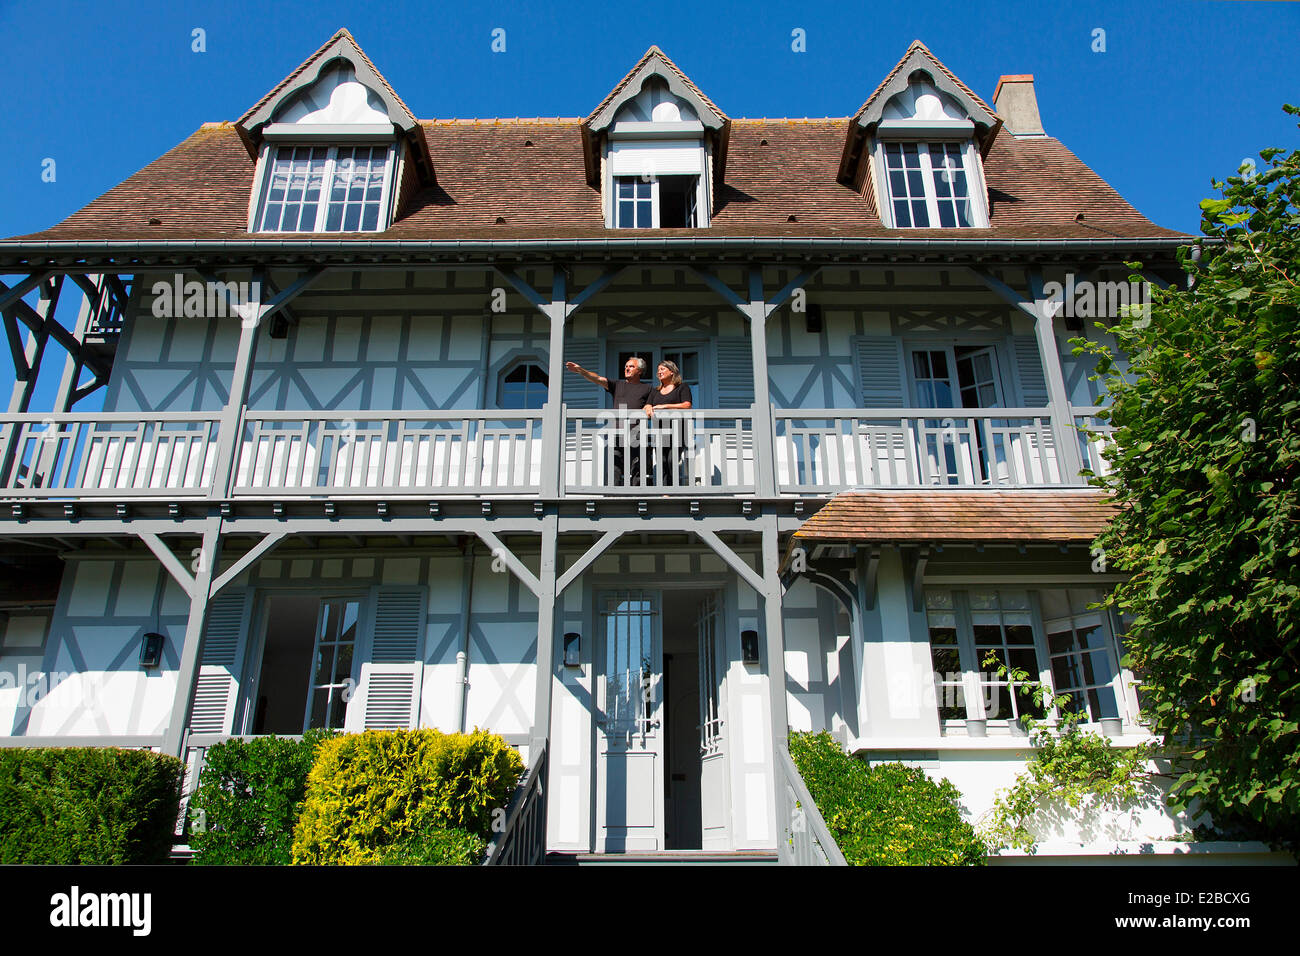 France, Calvados, Trouville sur Mer, la villa Photo Stock